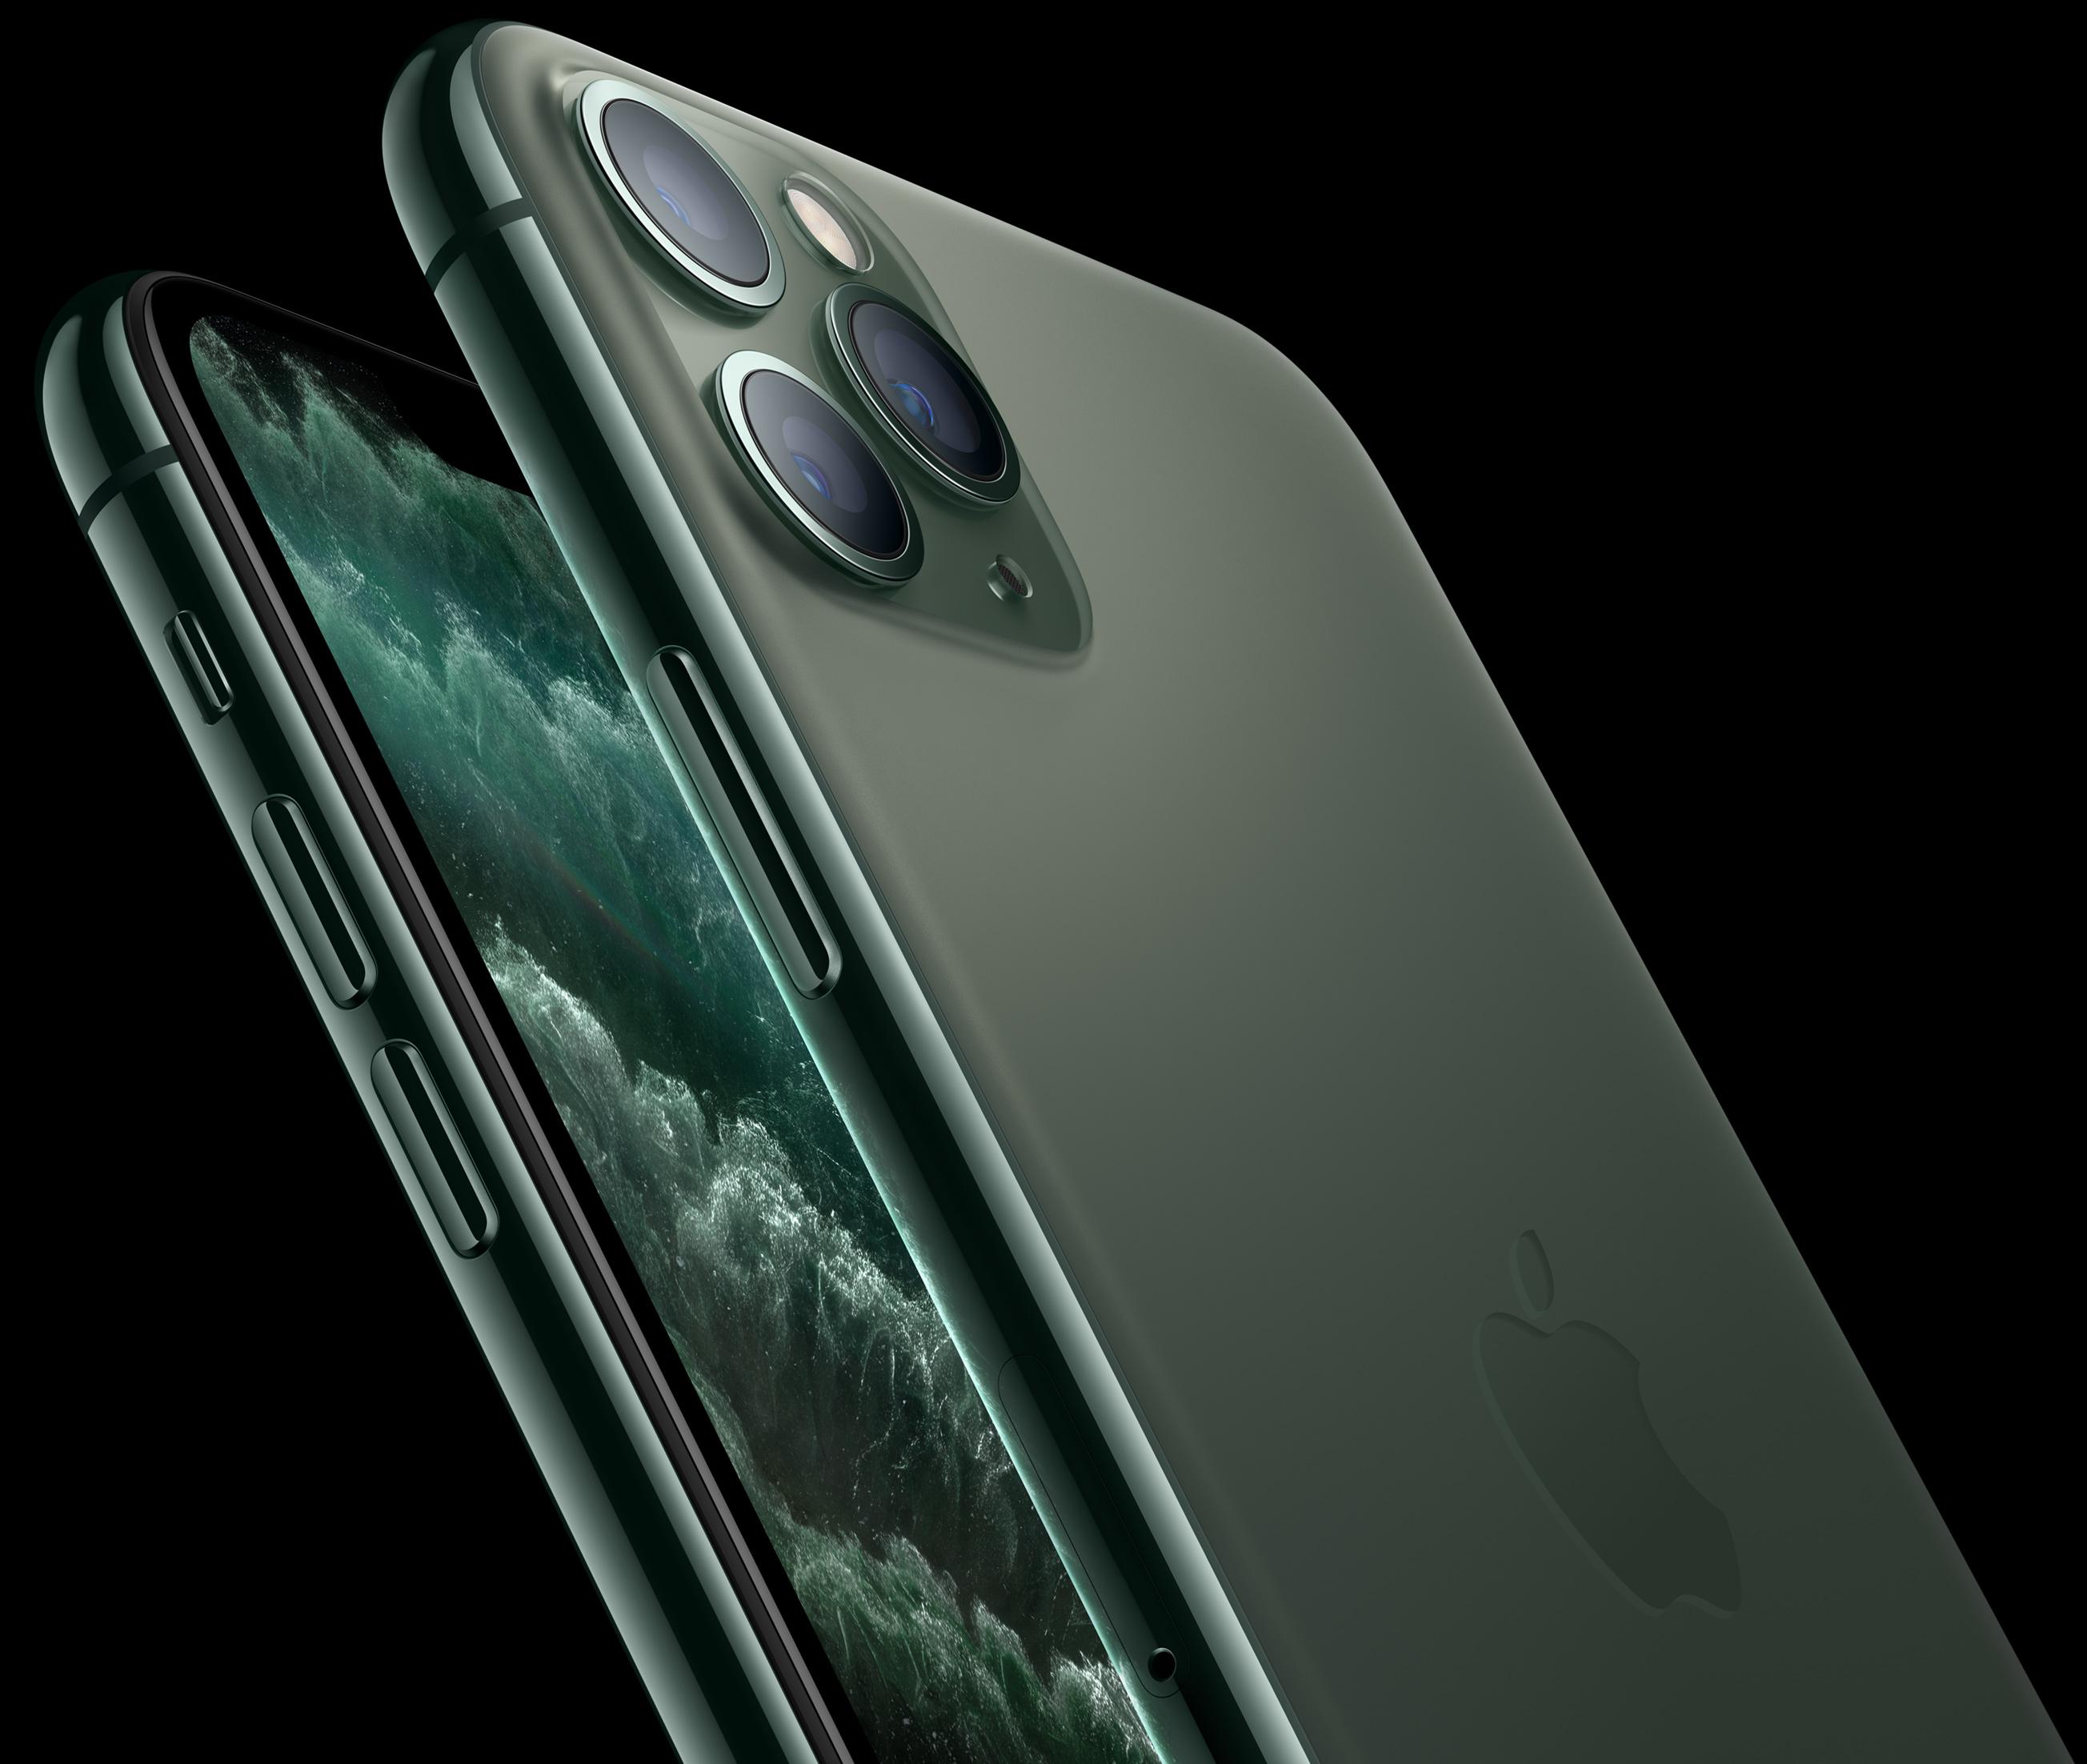 айфон 11 про макс 256 темно зеленый